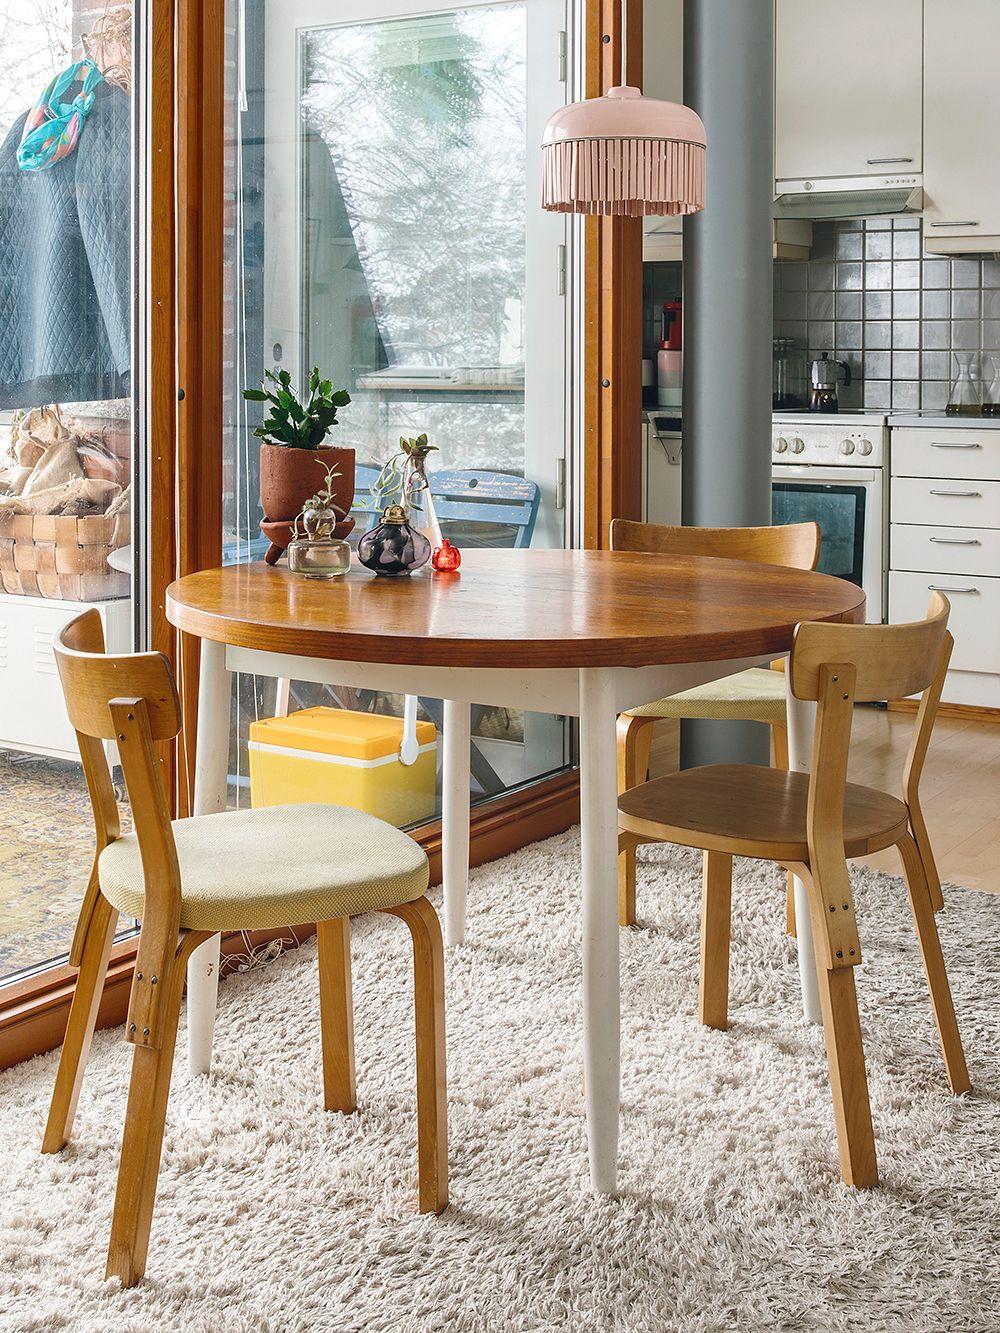 Artek 69 chairs around a table